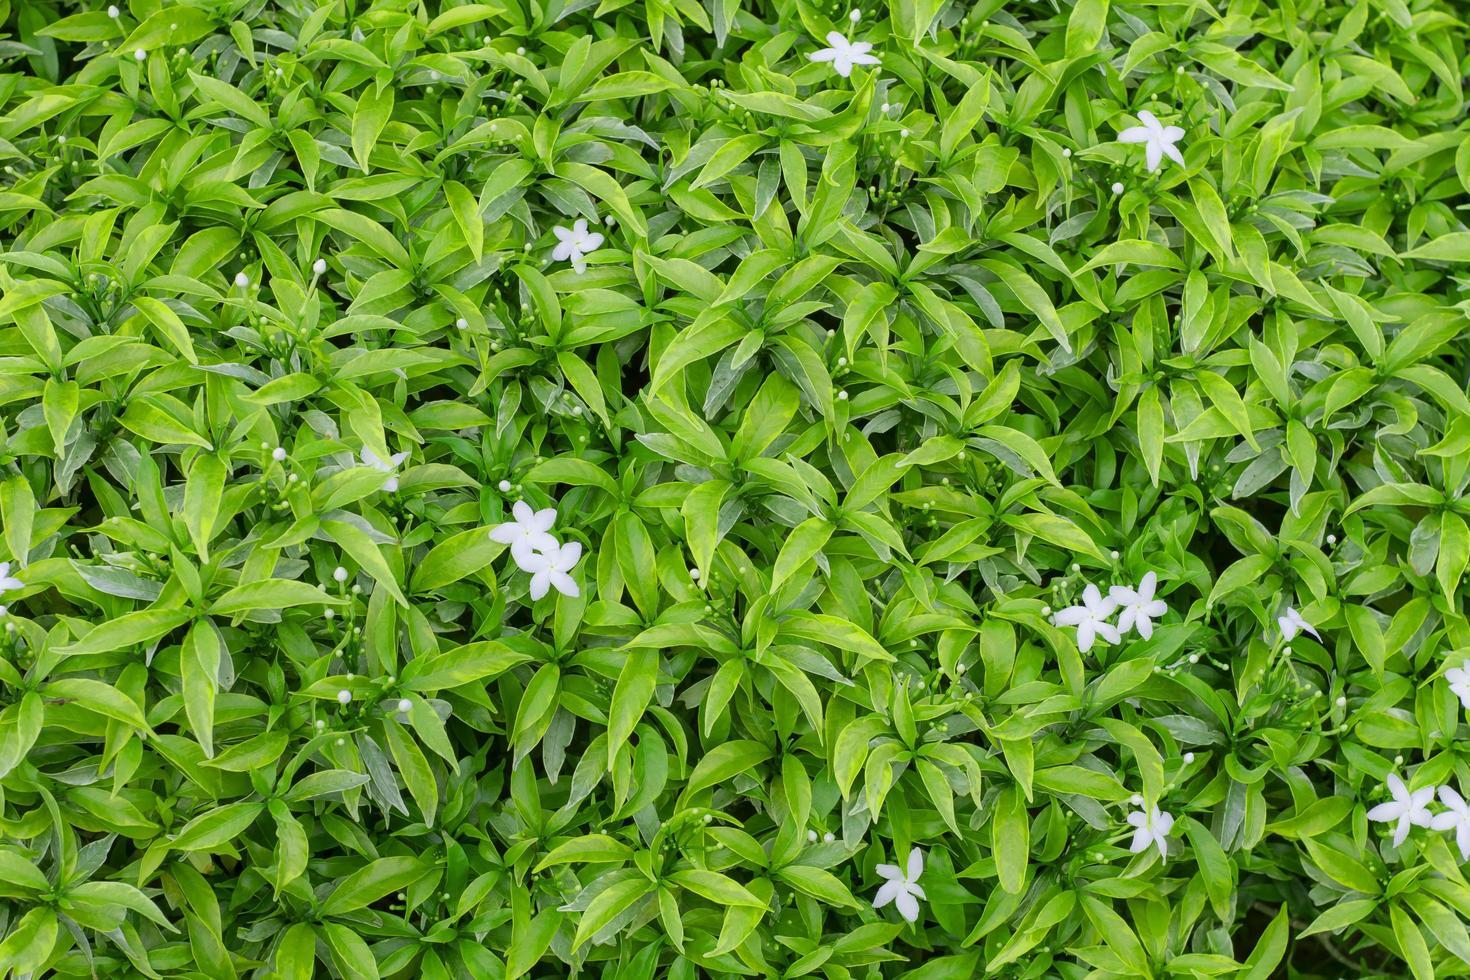 grünes Blatt Hintergrundtextur foto